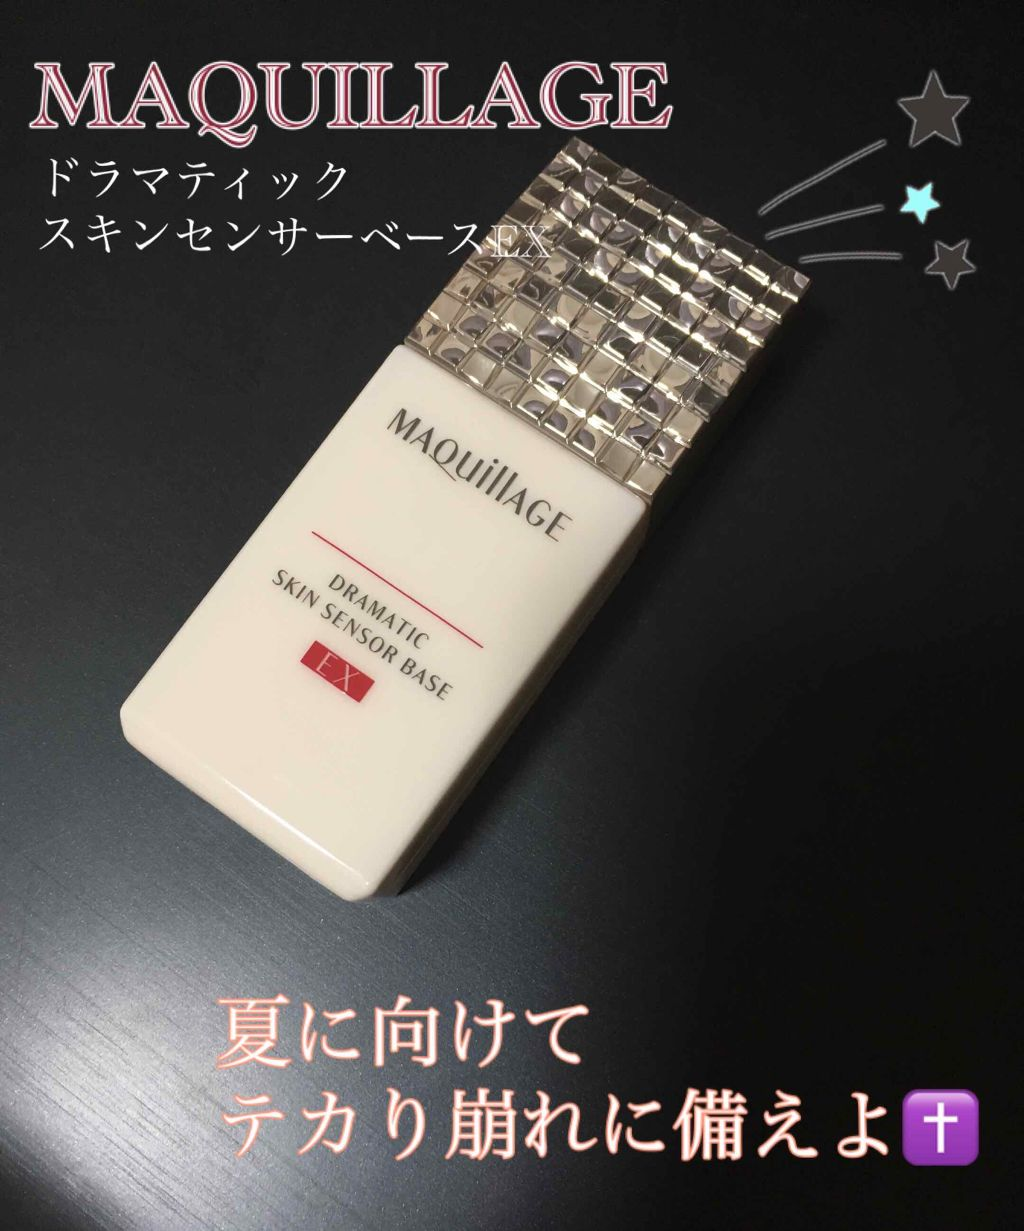 62b1fde9ff1a マキアージュ ドラマティックスキンセンサーベース UV(化粧下地)を使ったクチコミ